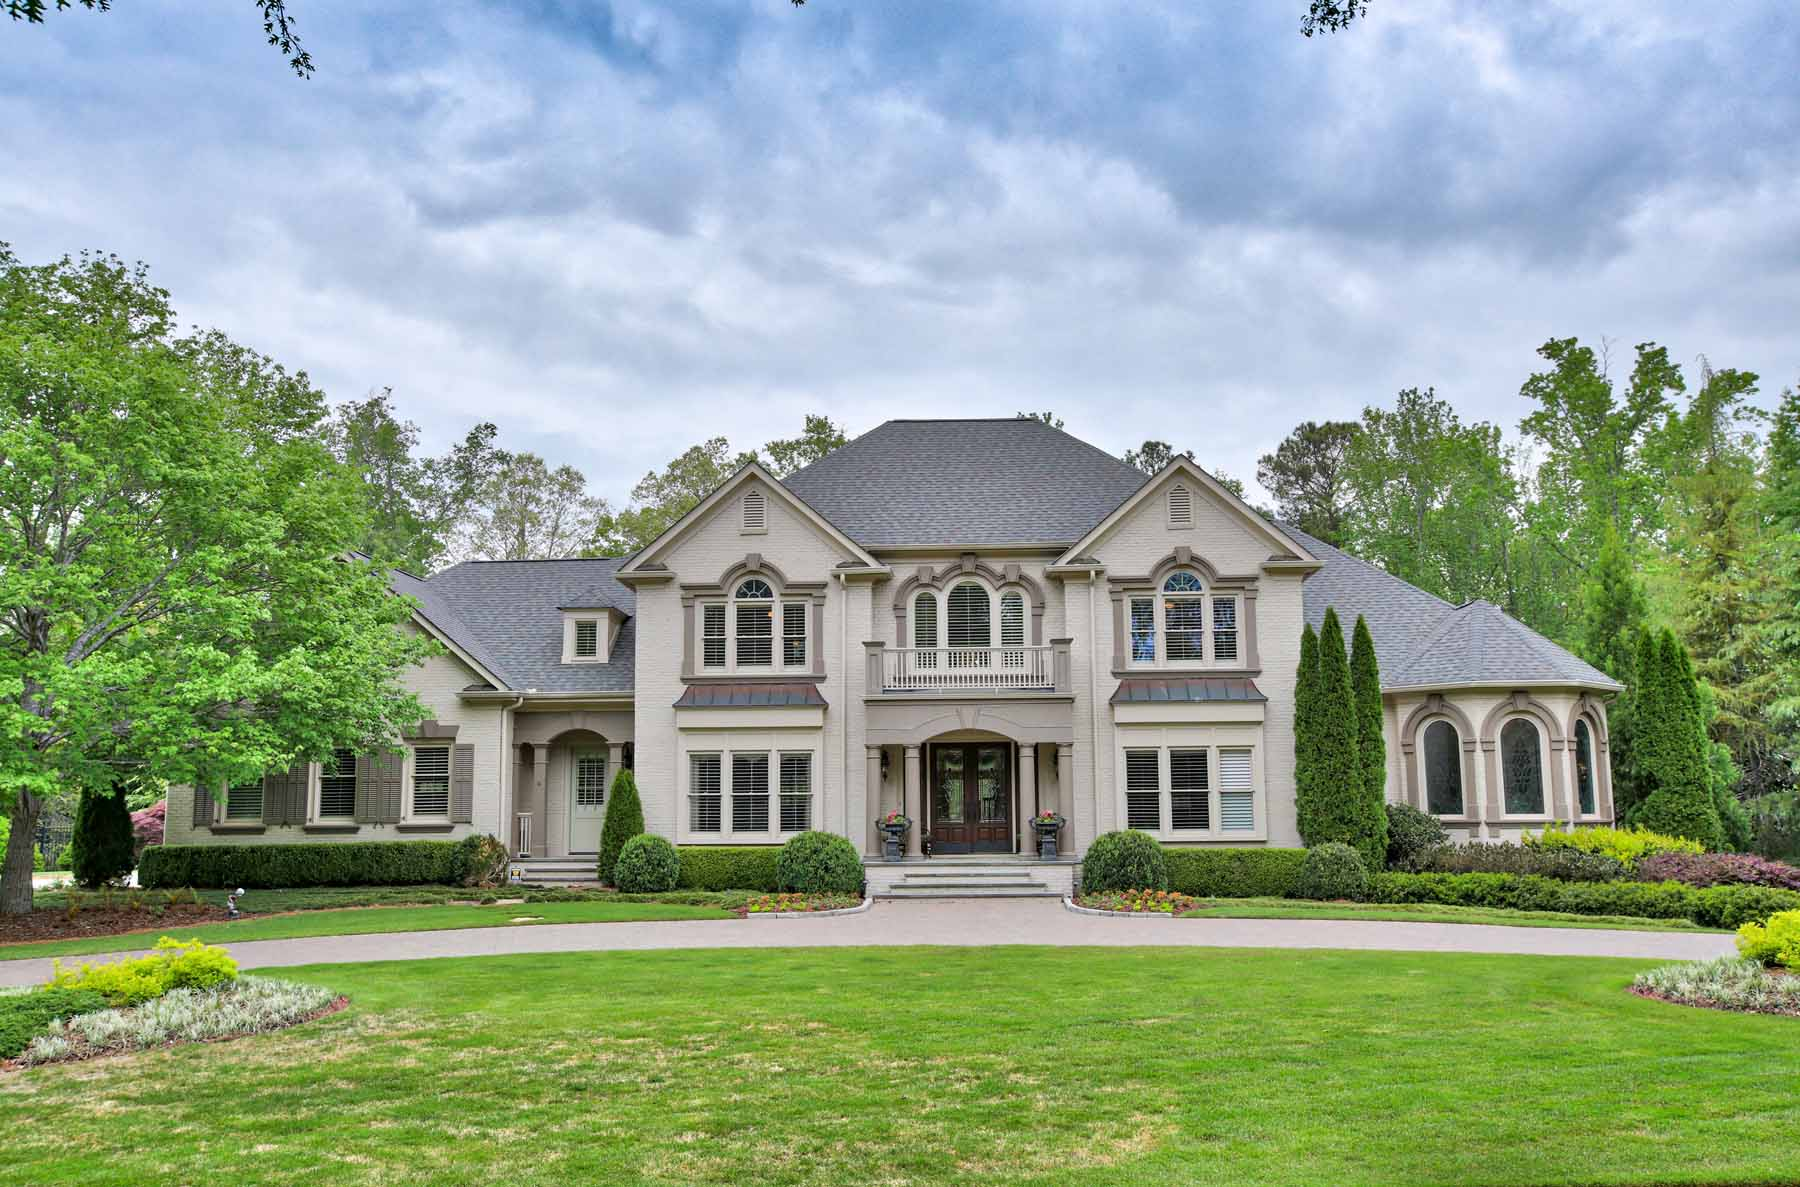 Enfamiljshus för Försäljning vid IncomparableRoswellEstate 810 Hedgegate Court Roswell, Georgien 30075 Usa